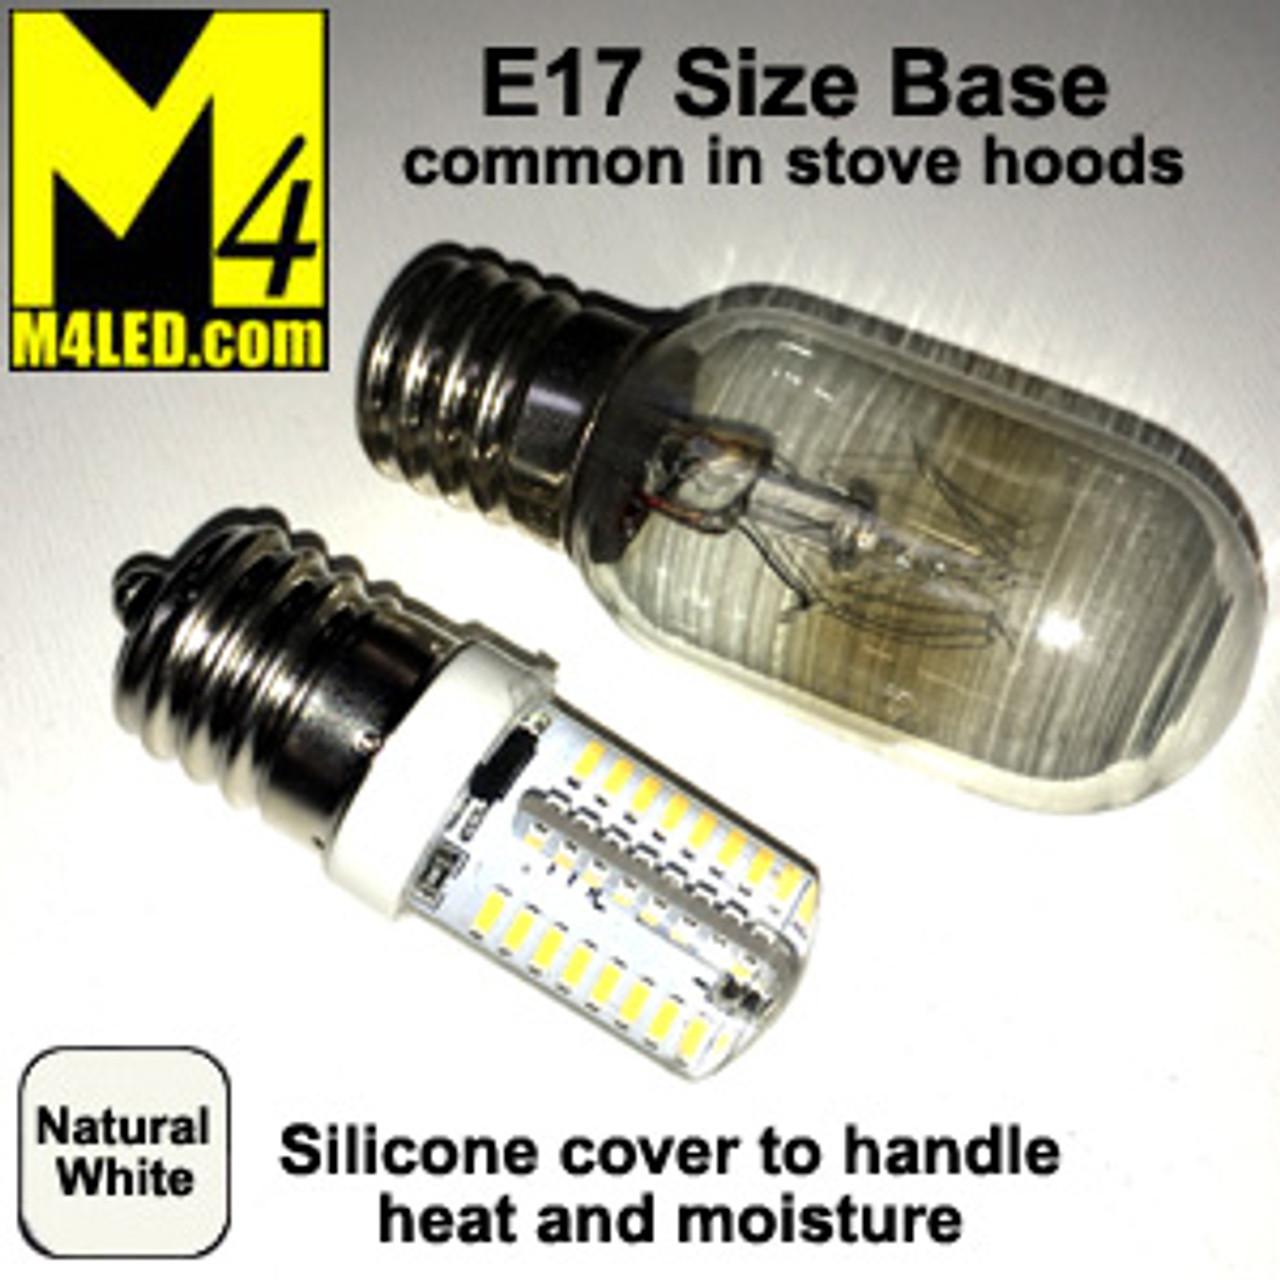 t25 sil nw natural white 110 120v t25 led with e17 base